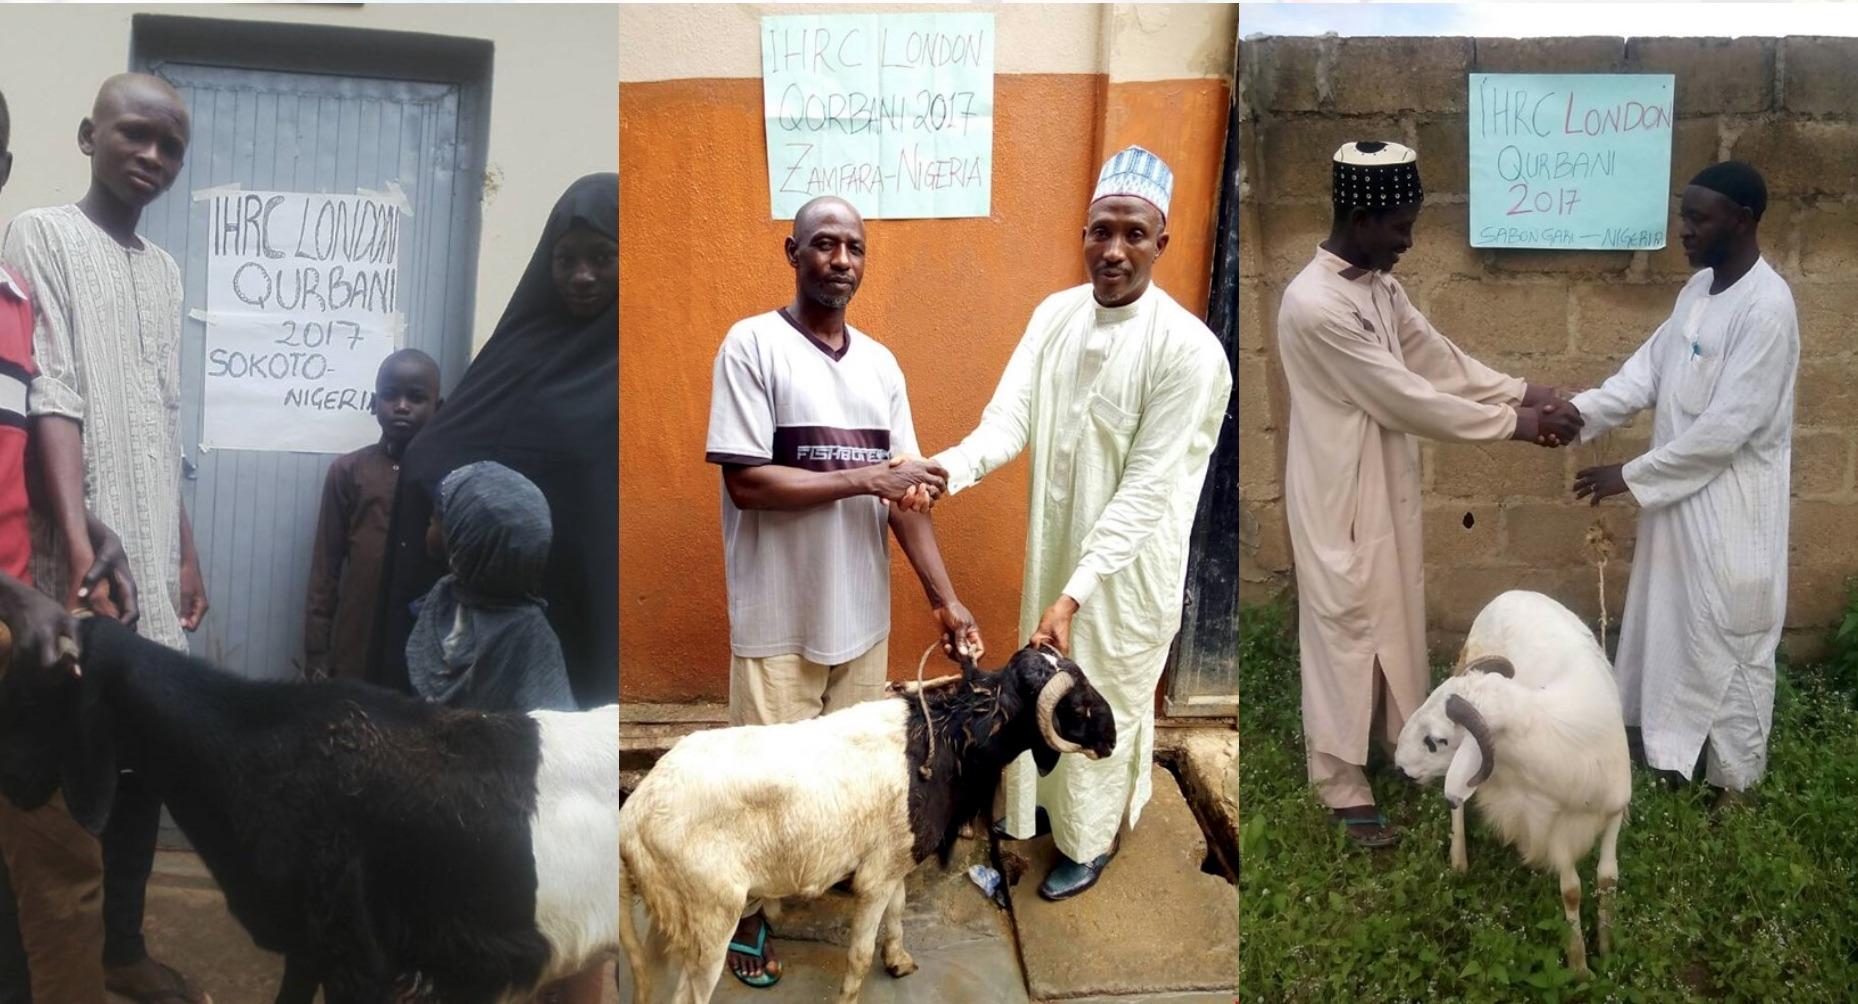 Qurbani 2019 – Remember Nigeria – IHRC